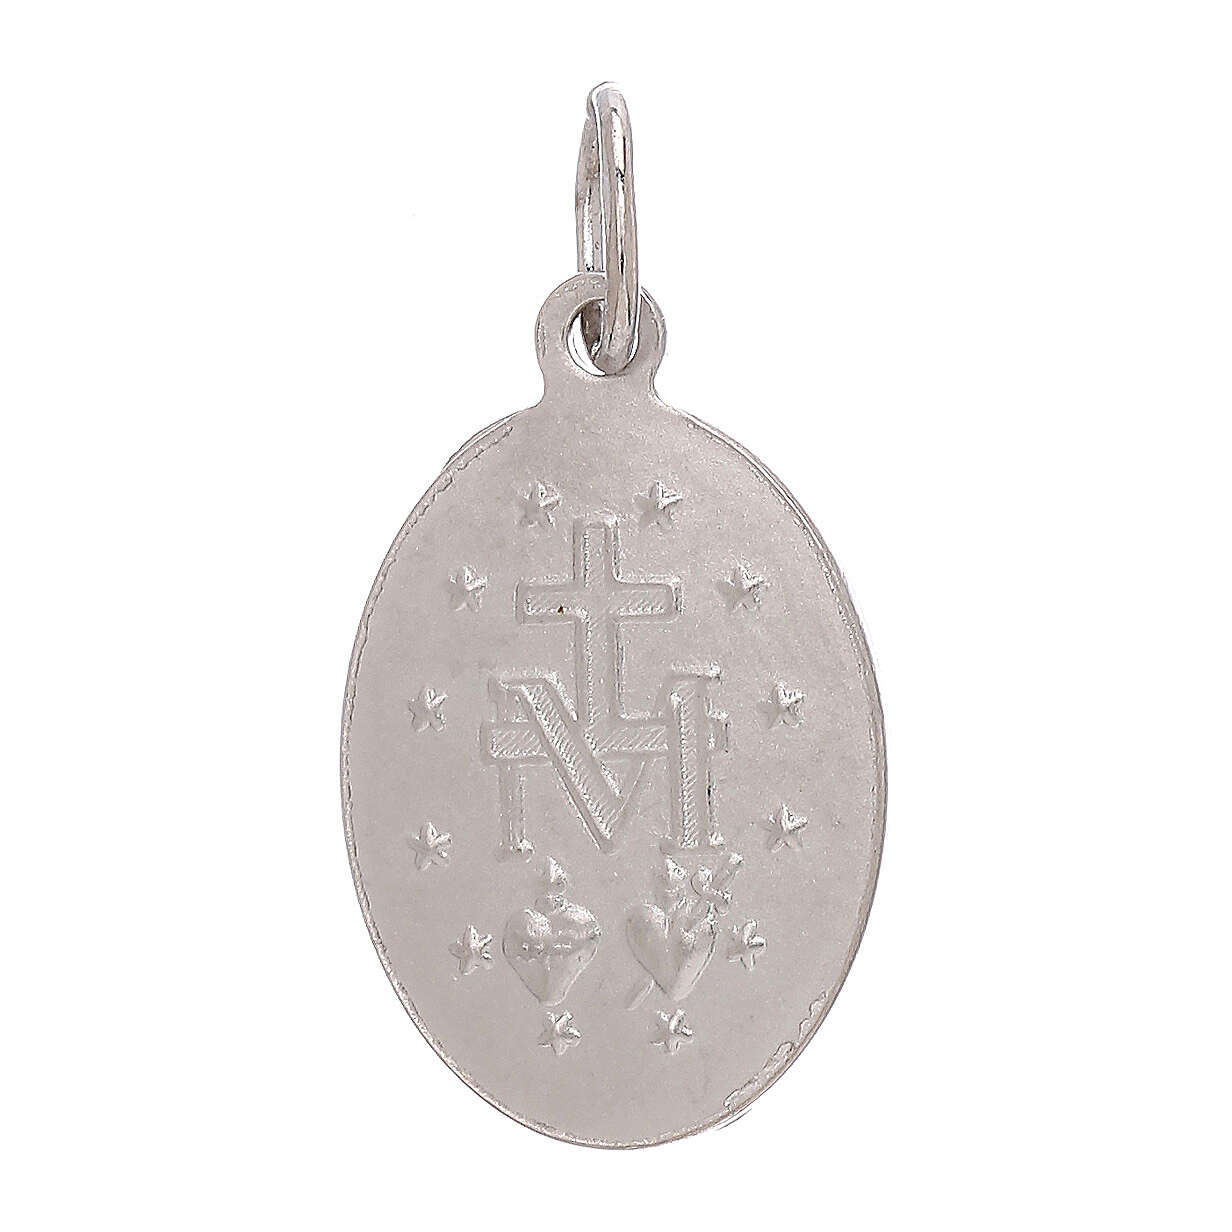 Colgante Medalla Milagrosa oro blanco 750/00 1,8 gramos 4